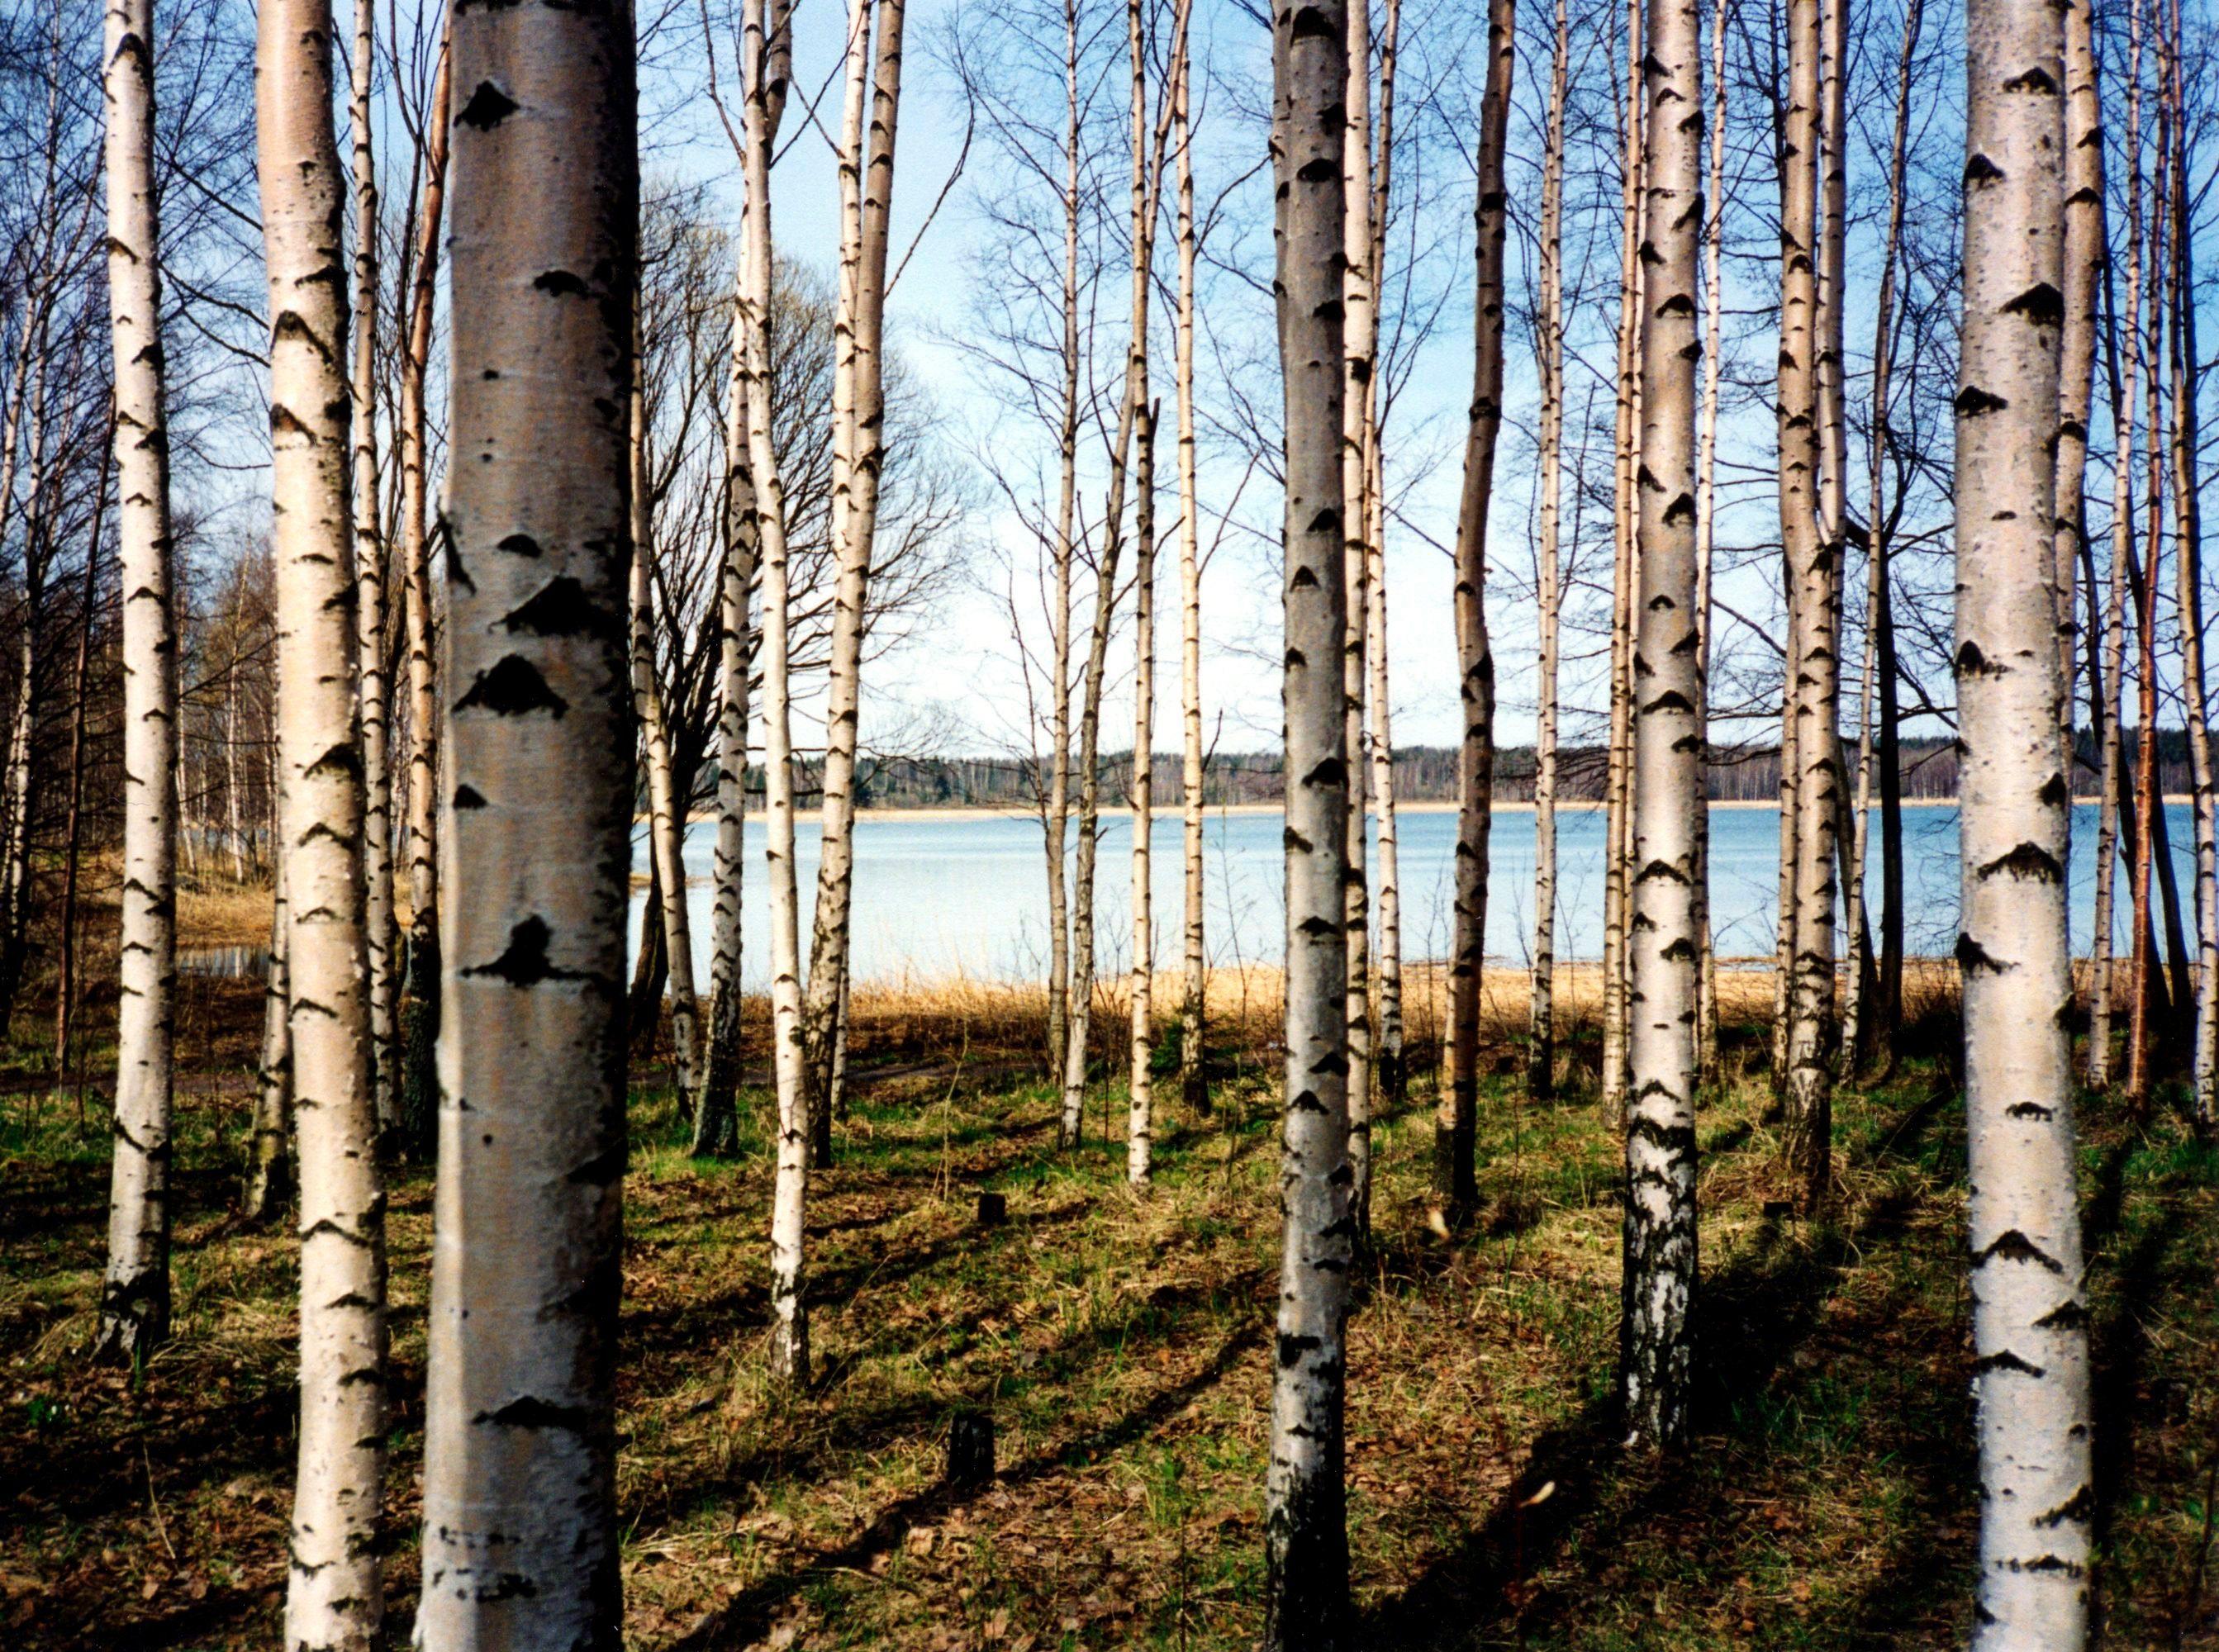 PAPERMOON Fototapete »Finnish Forest of Birch Trees«, Vlies, 7 Bahnen, 350 x 260 cm